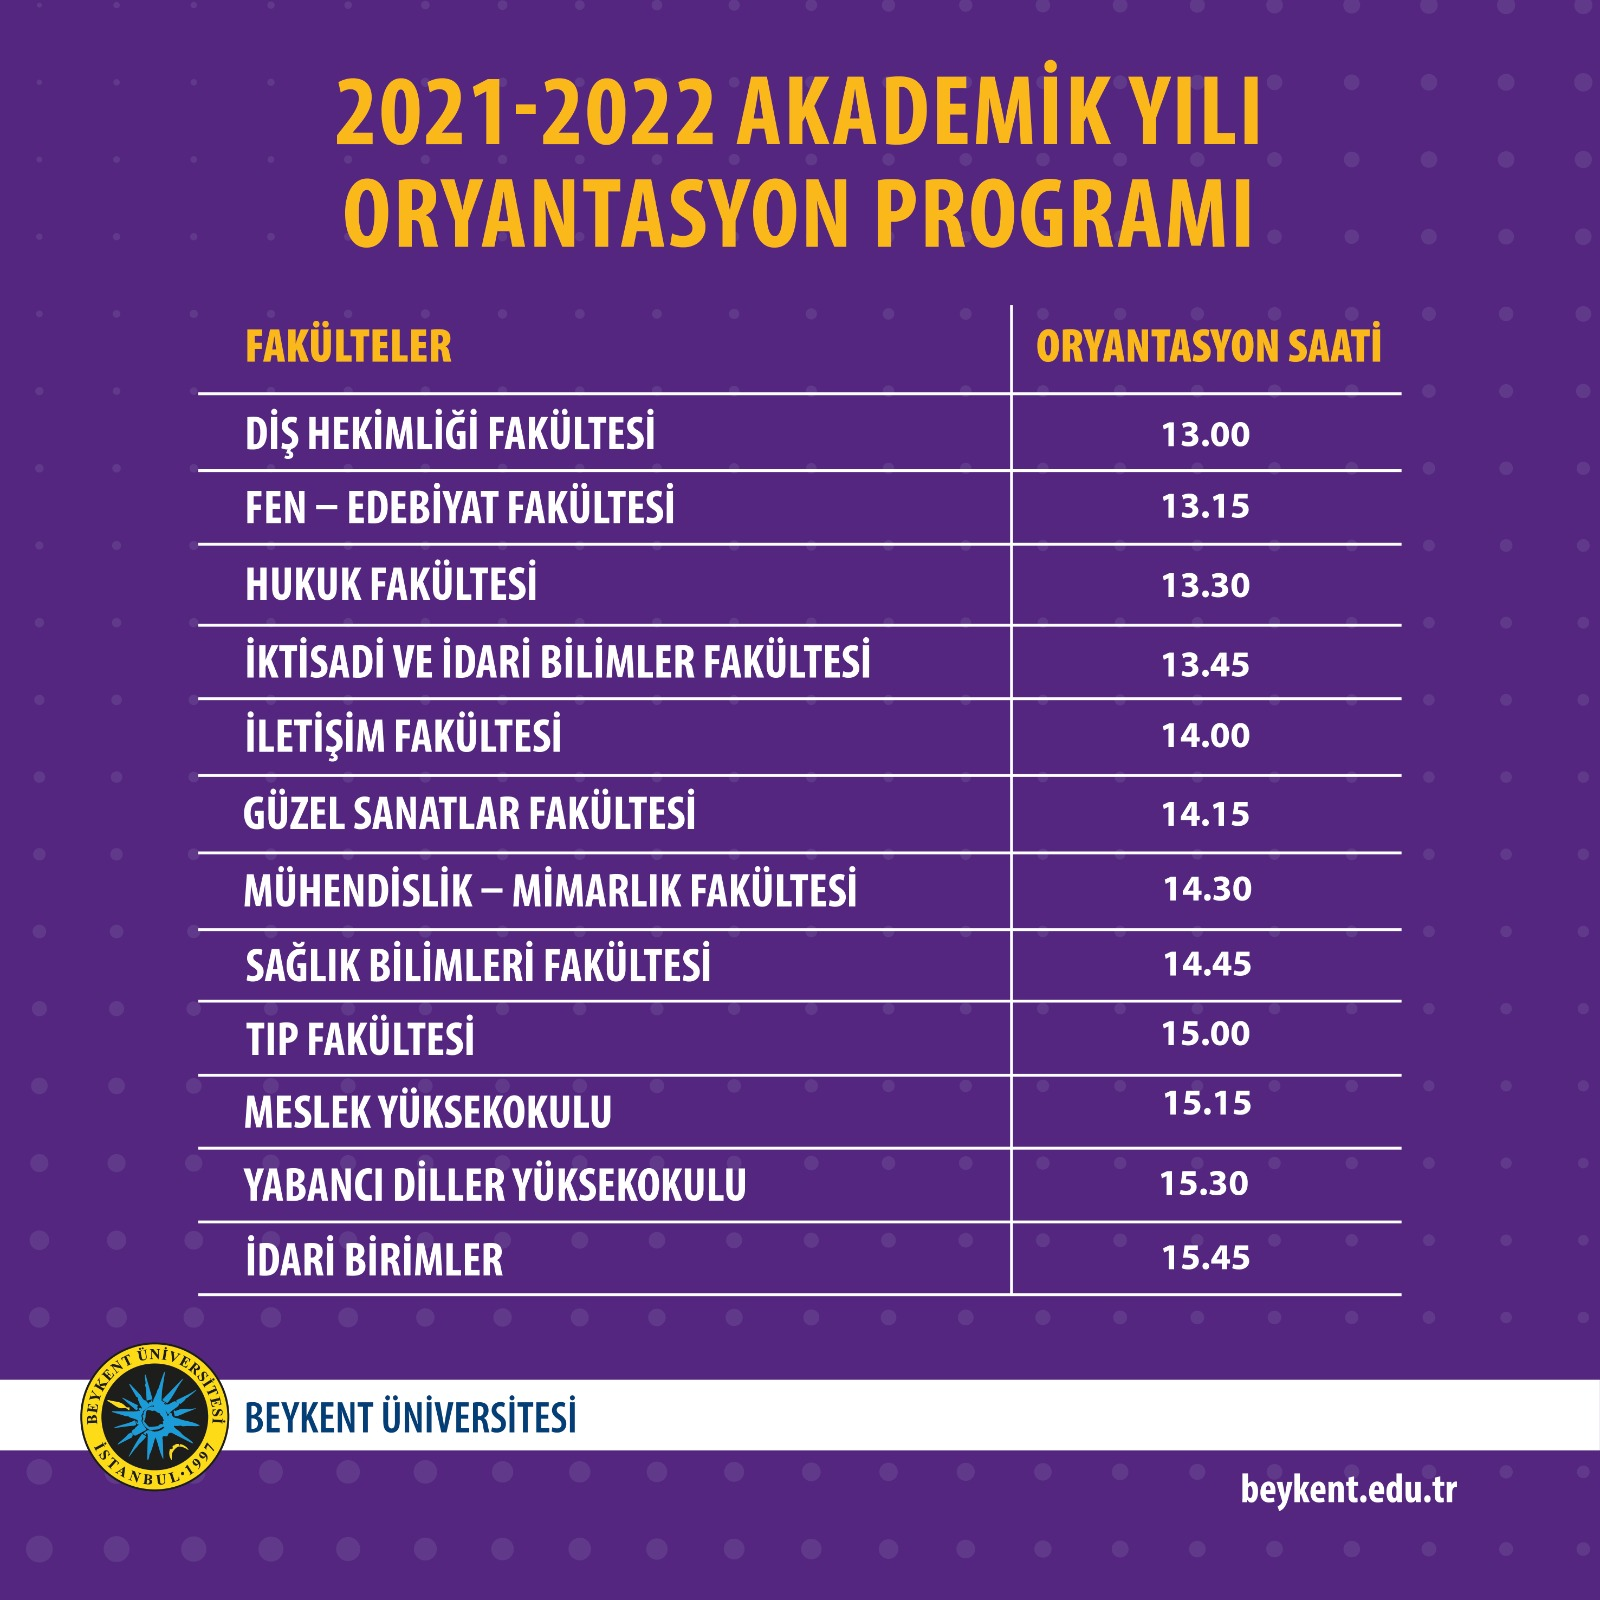 2021-2022-akademik-yili-oryantasyon-programi